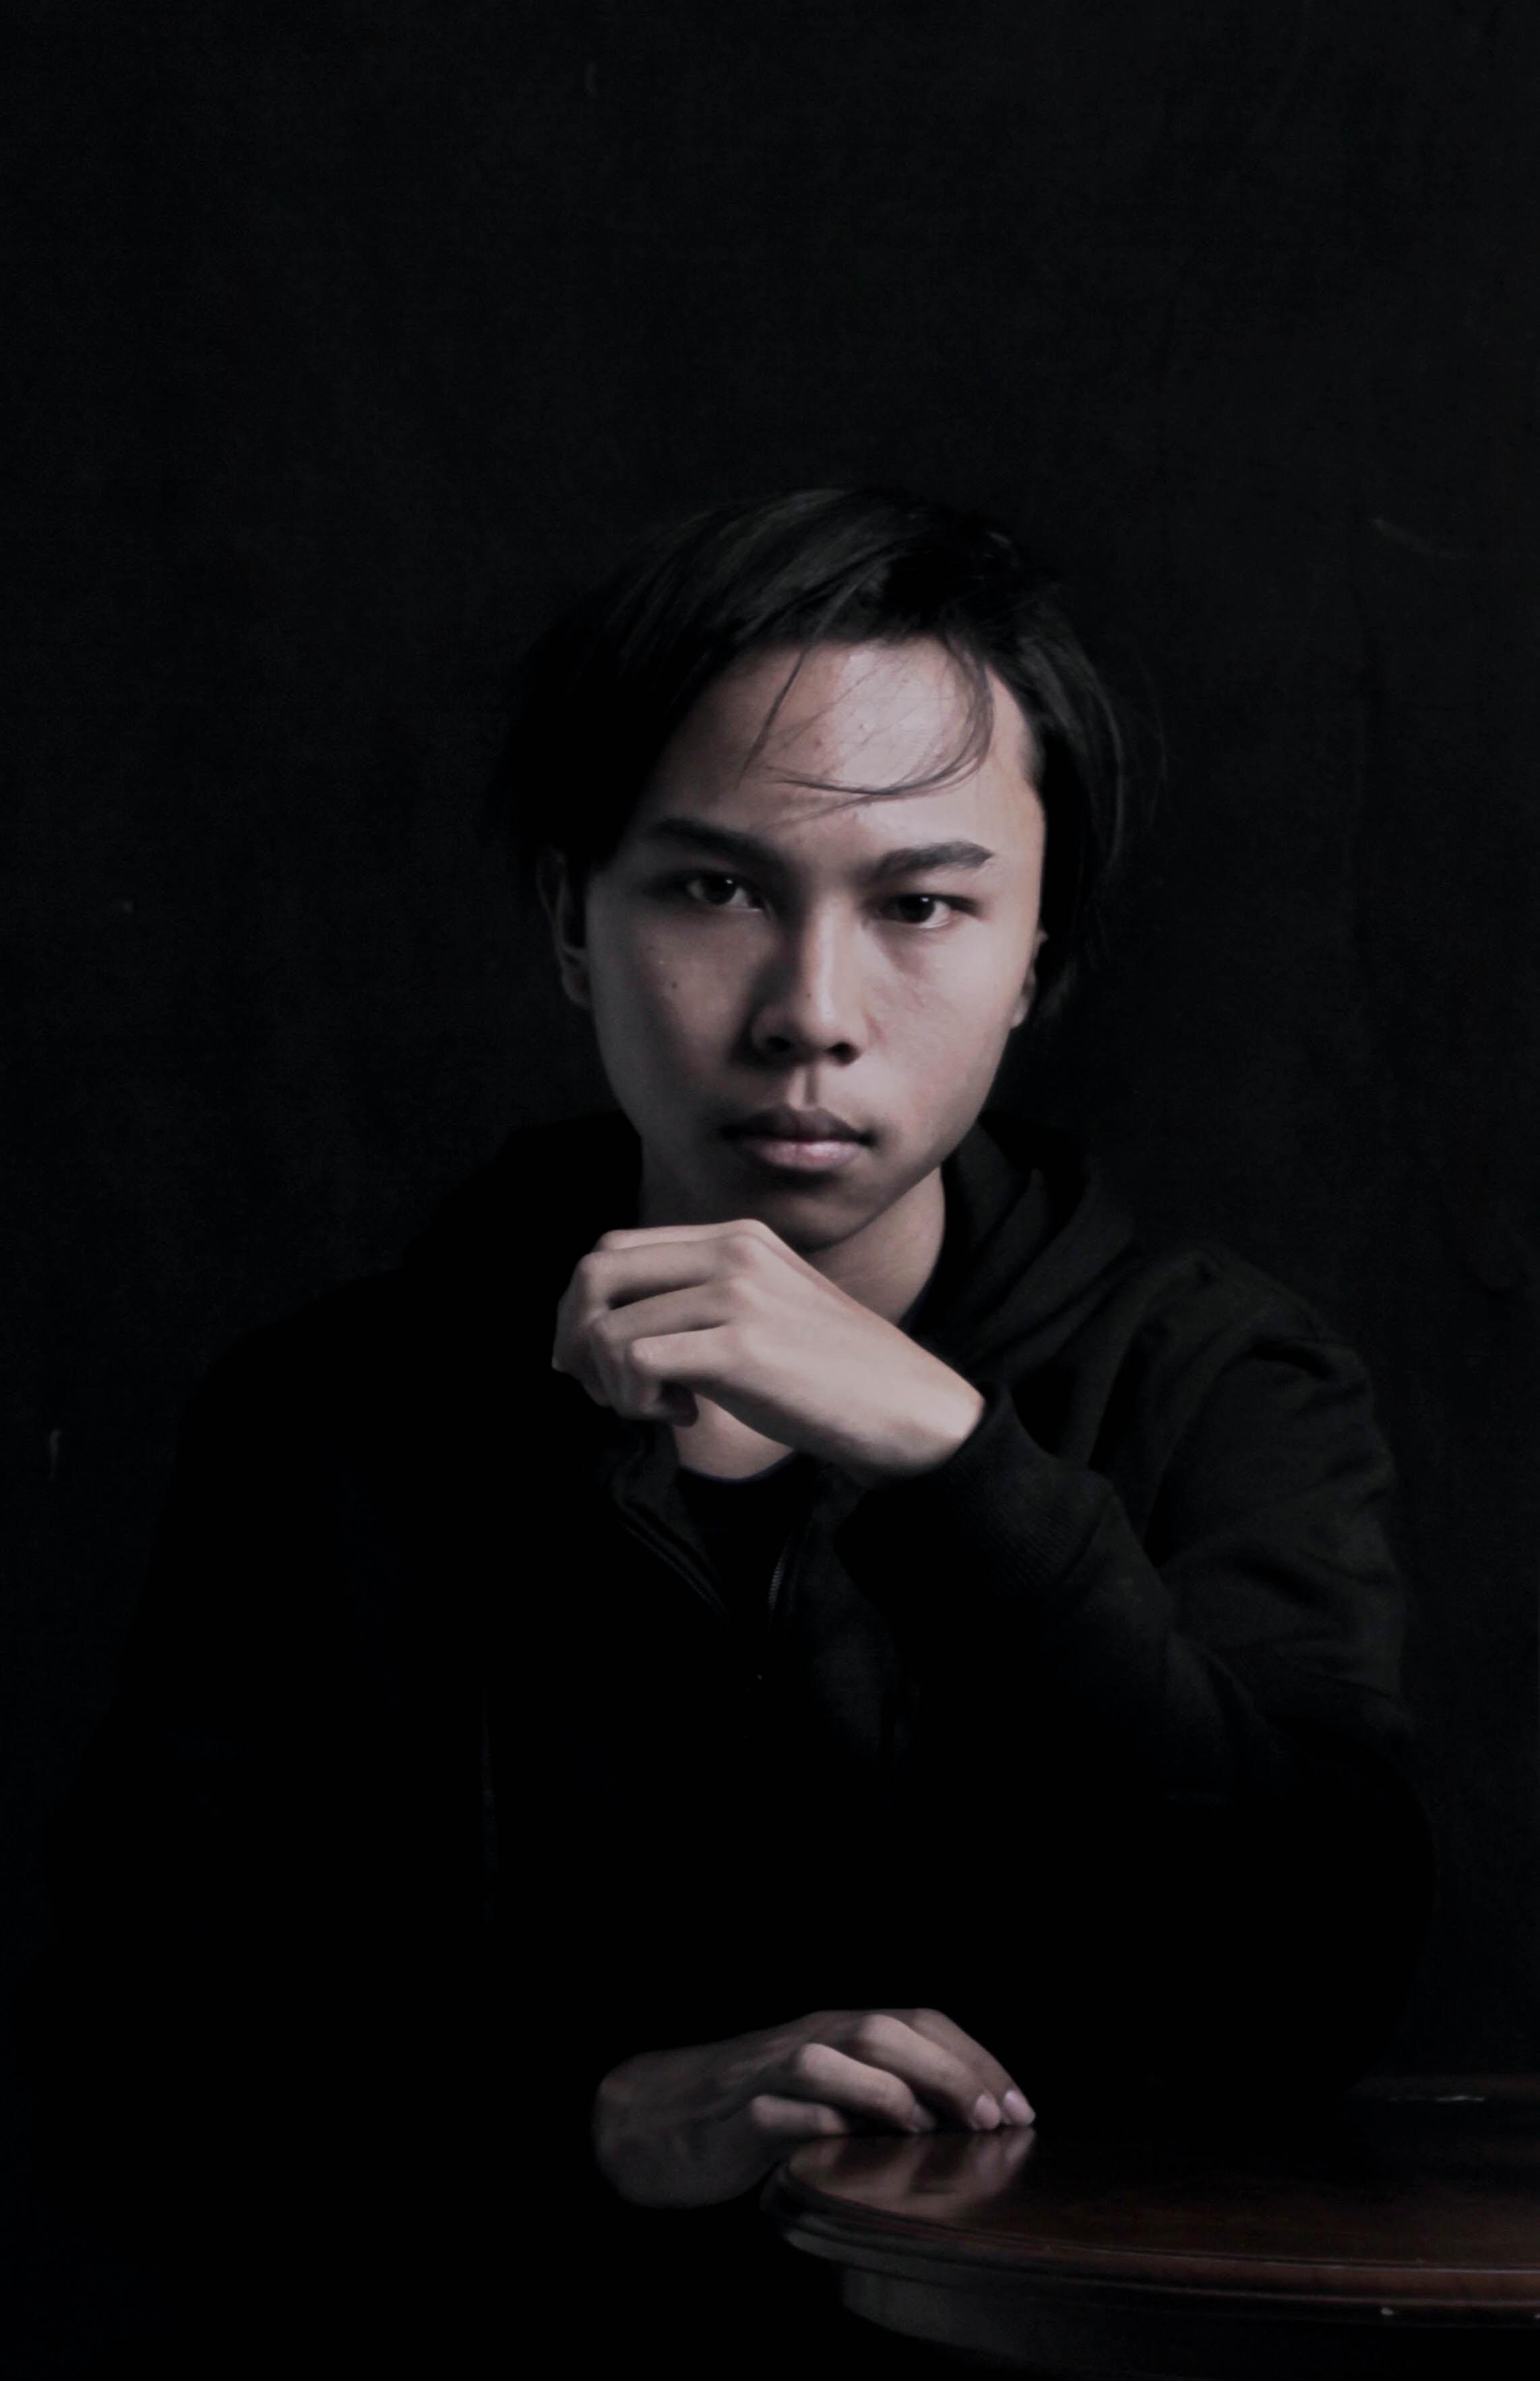 Go to Ariv Kurniawan's profile